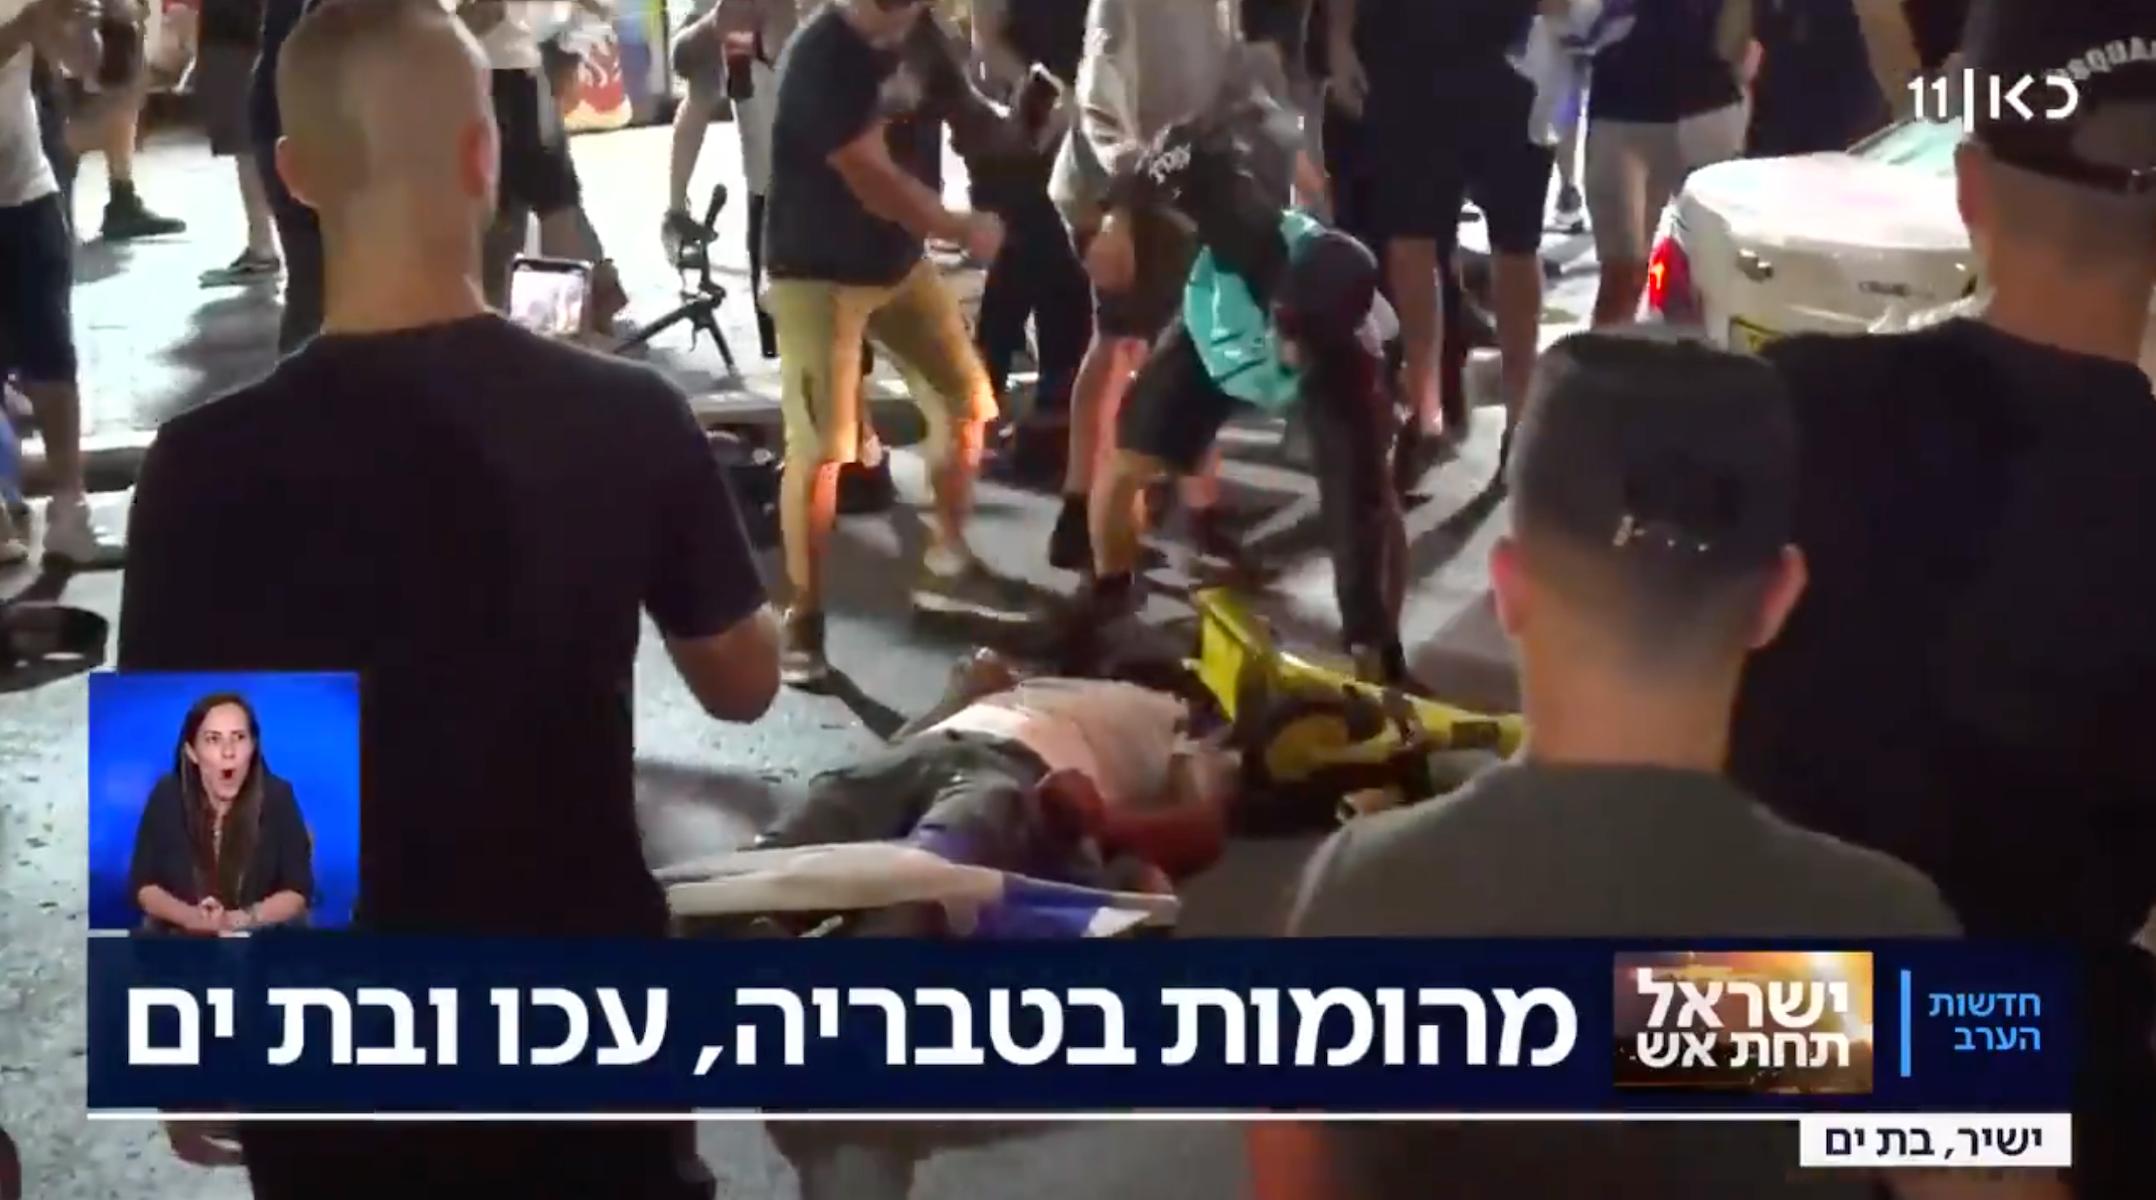 A man beats someone lying prone on the ground in the Israeli city of Bat Yam, amid interethnic violence across Israel. (Screenshot)